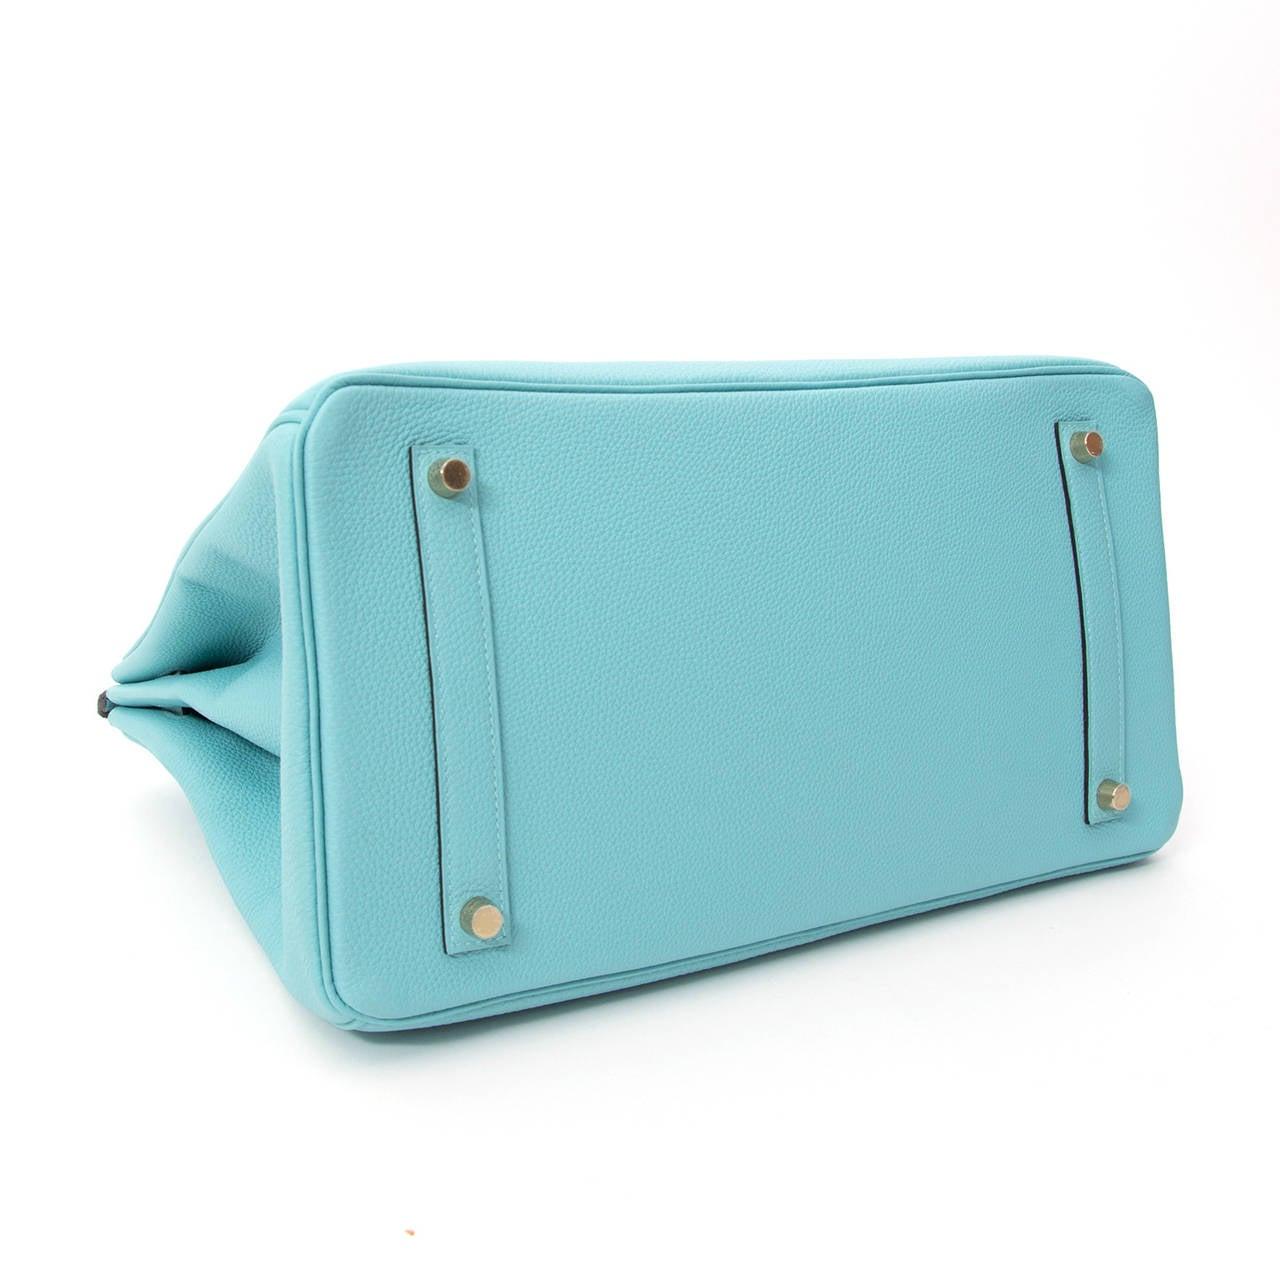 b6d3a38df21e Women s BRAND NEW Hermès Birkin Togo Bleu Atoll GHW 35 For Sale